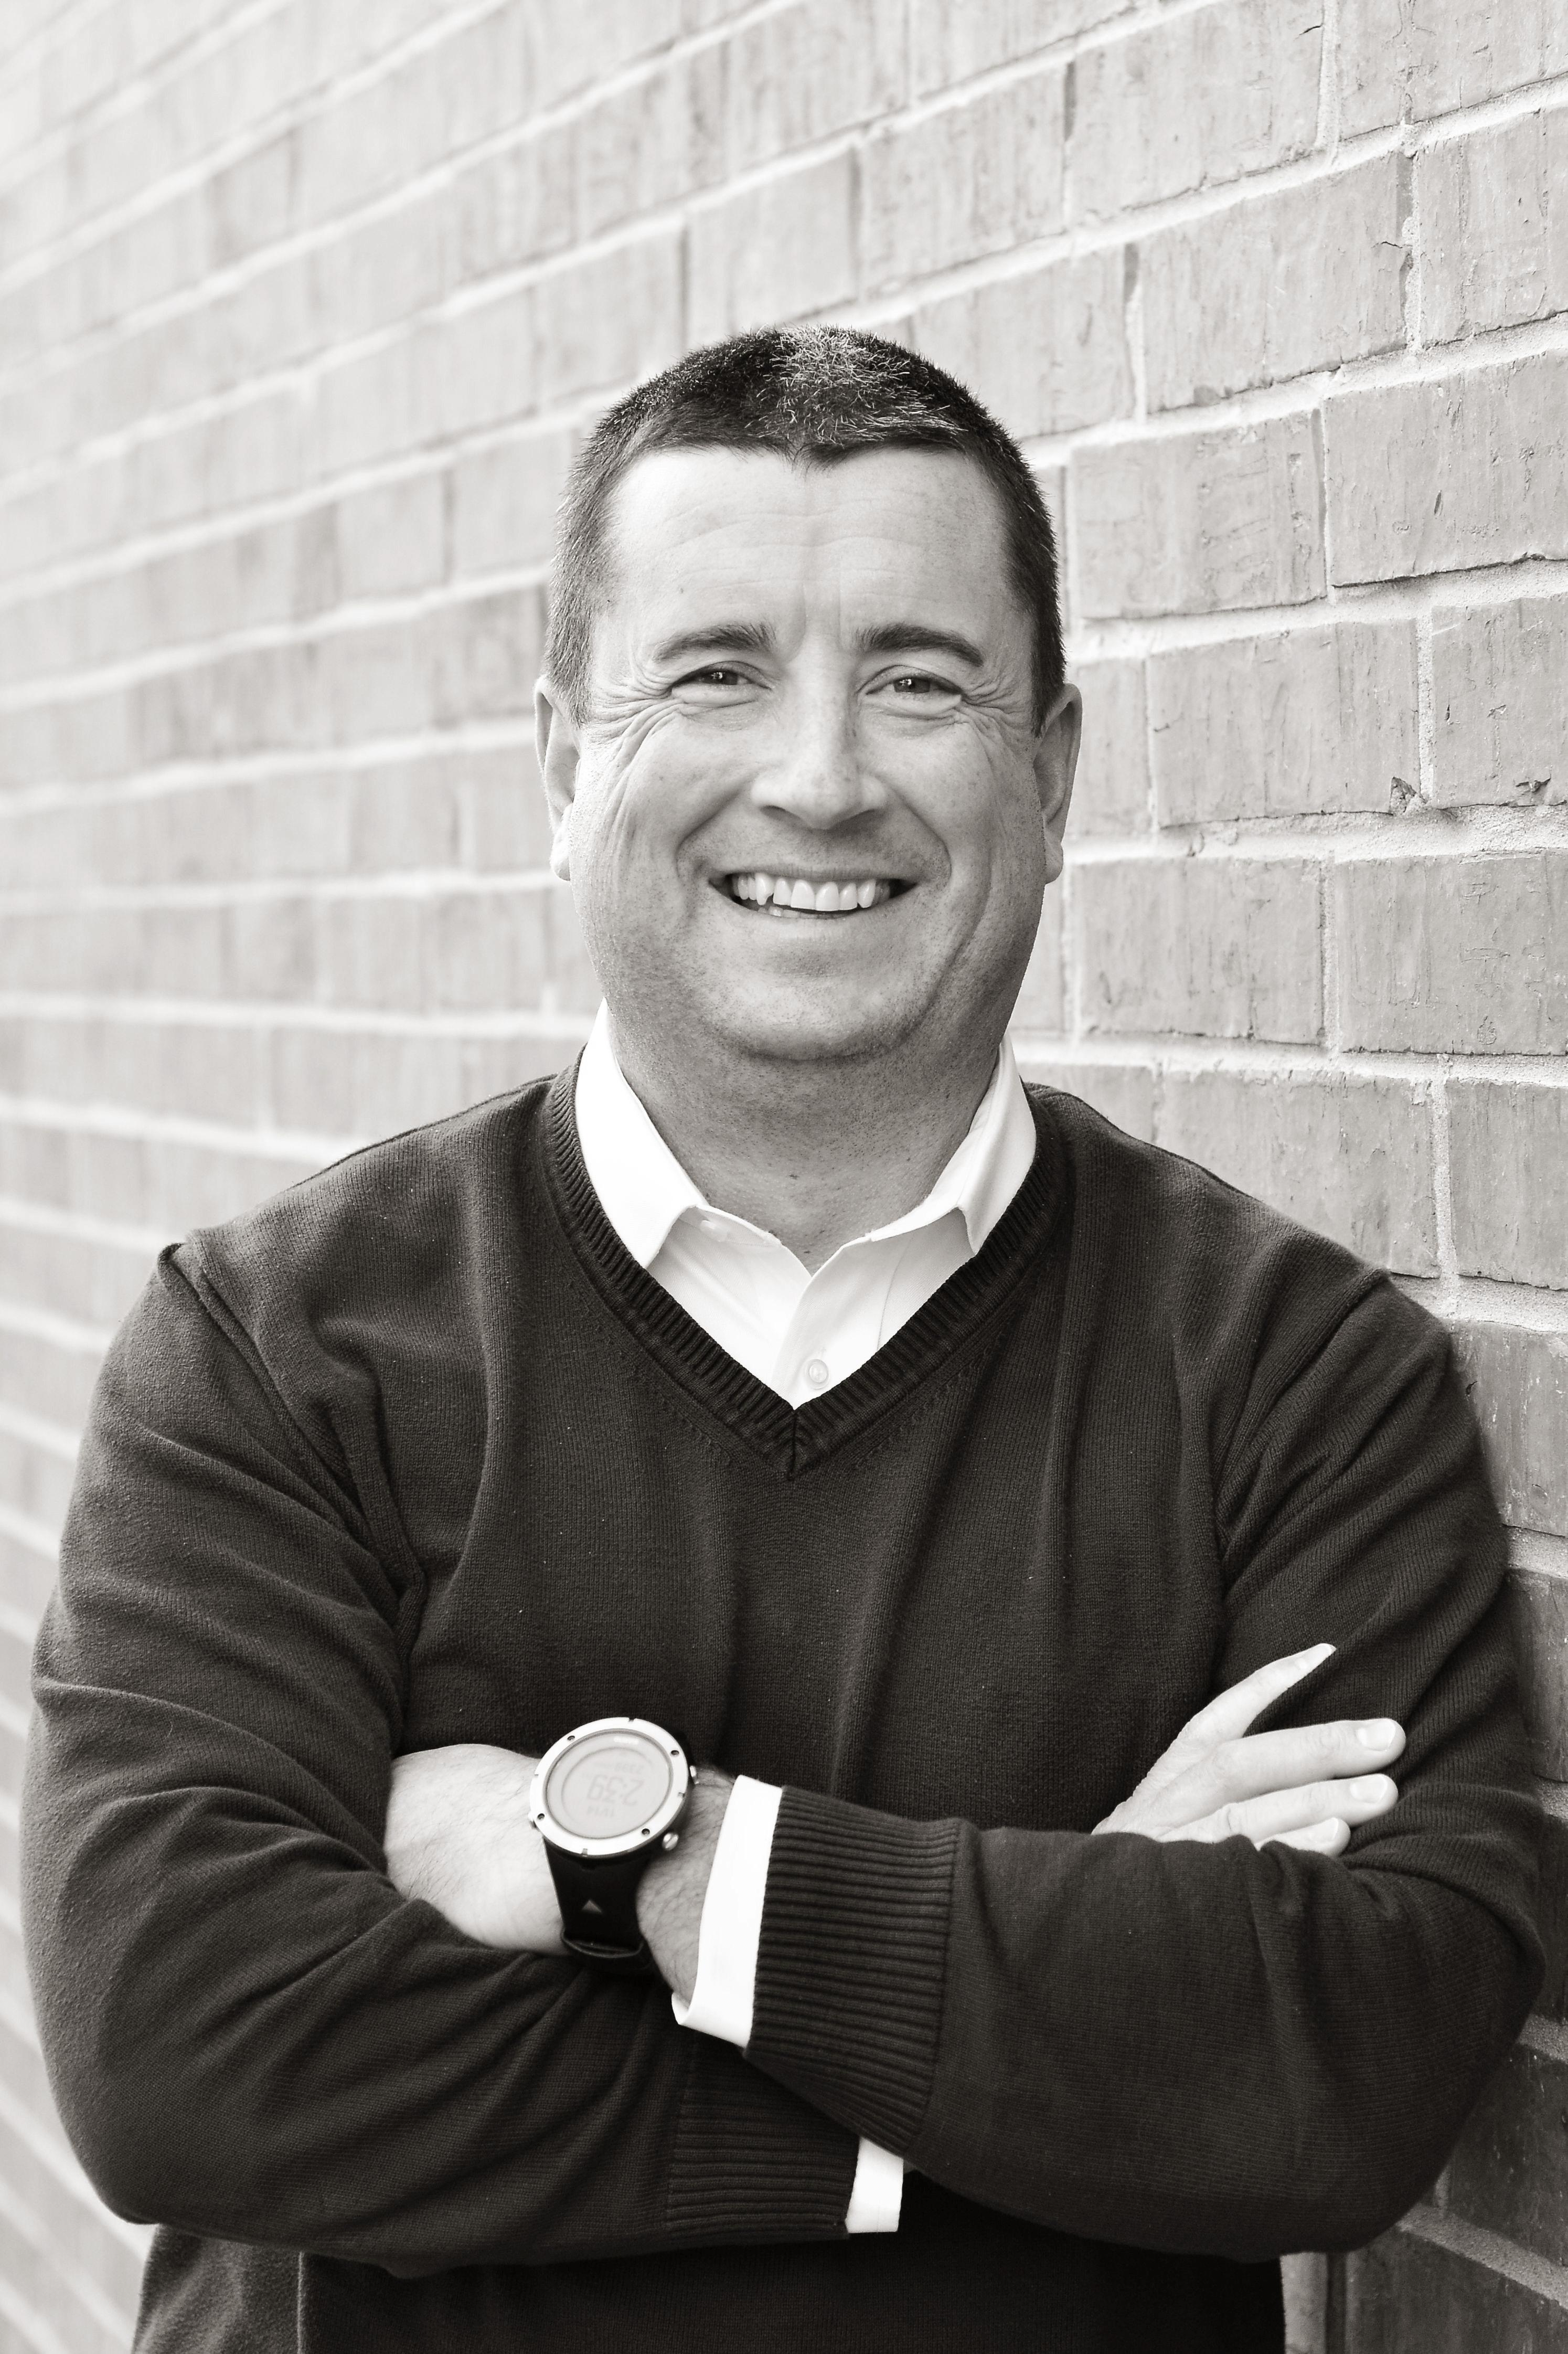 Daniel Keough